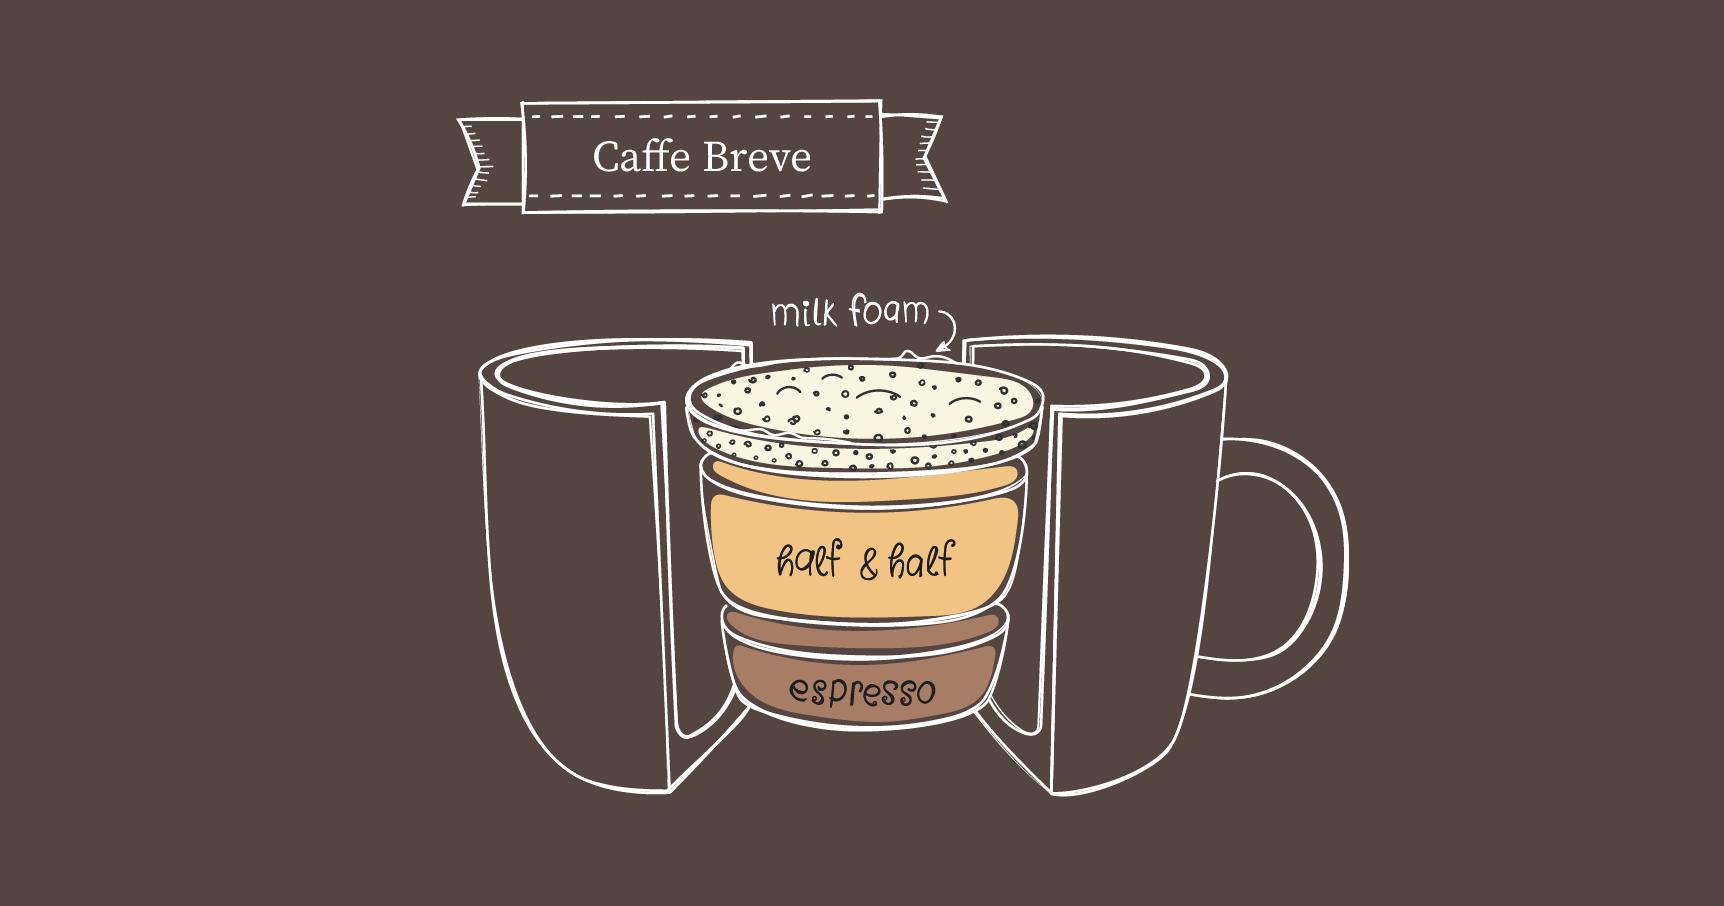 Caffe Breve ratio illustration